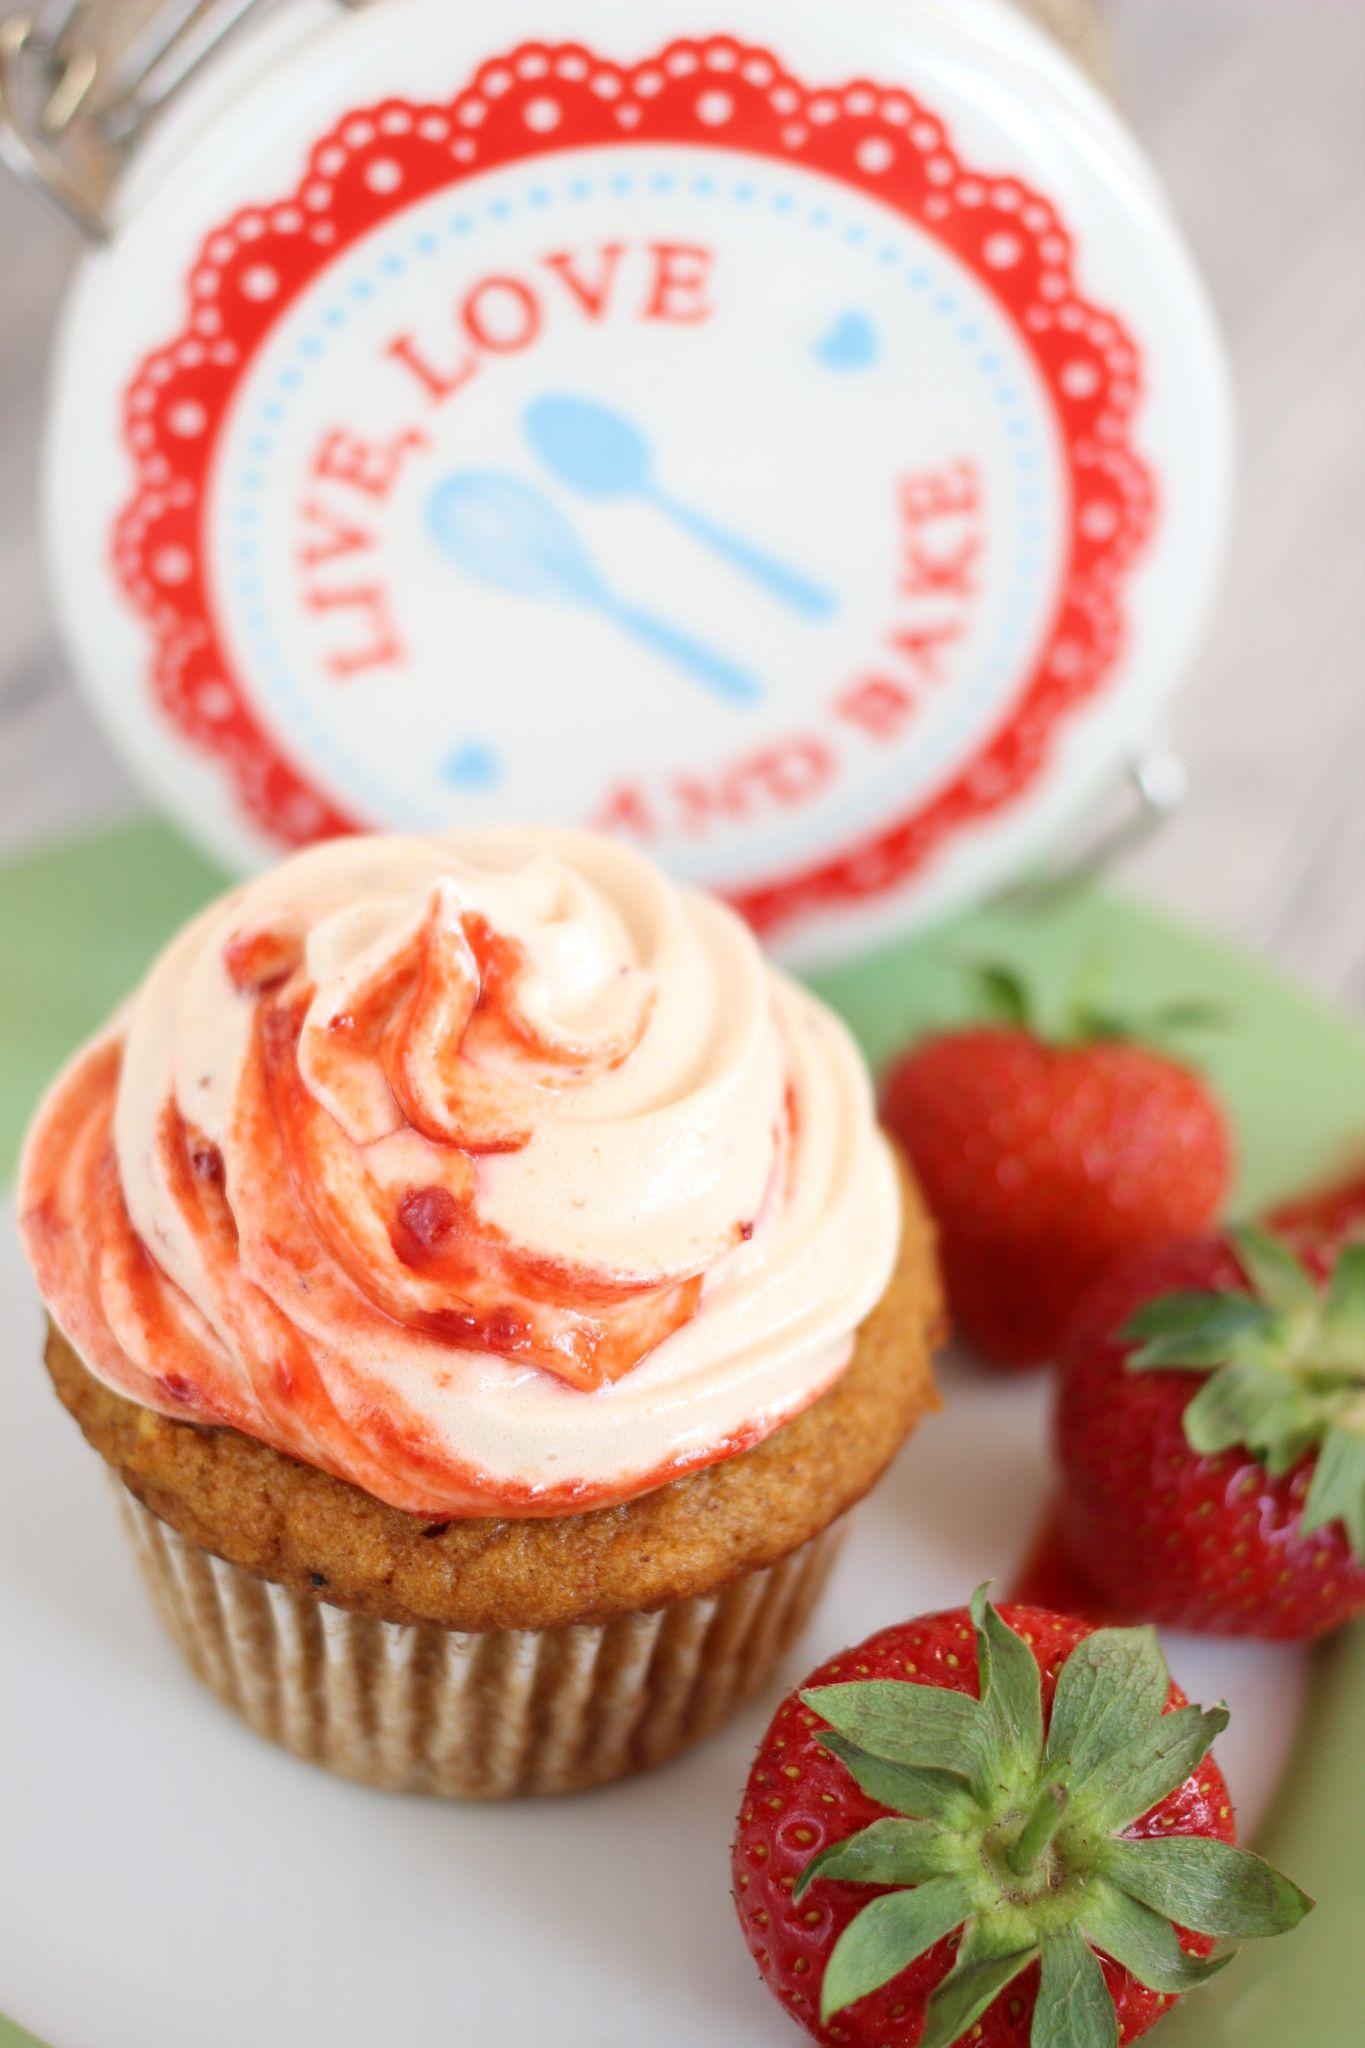 Marshmallow Mango Himbeere Cupcake Rezept Cupcakes Lebensmittel Essen Susse Brotchen